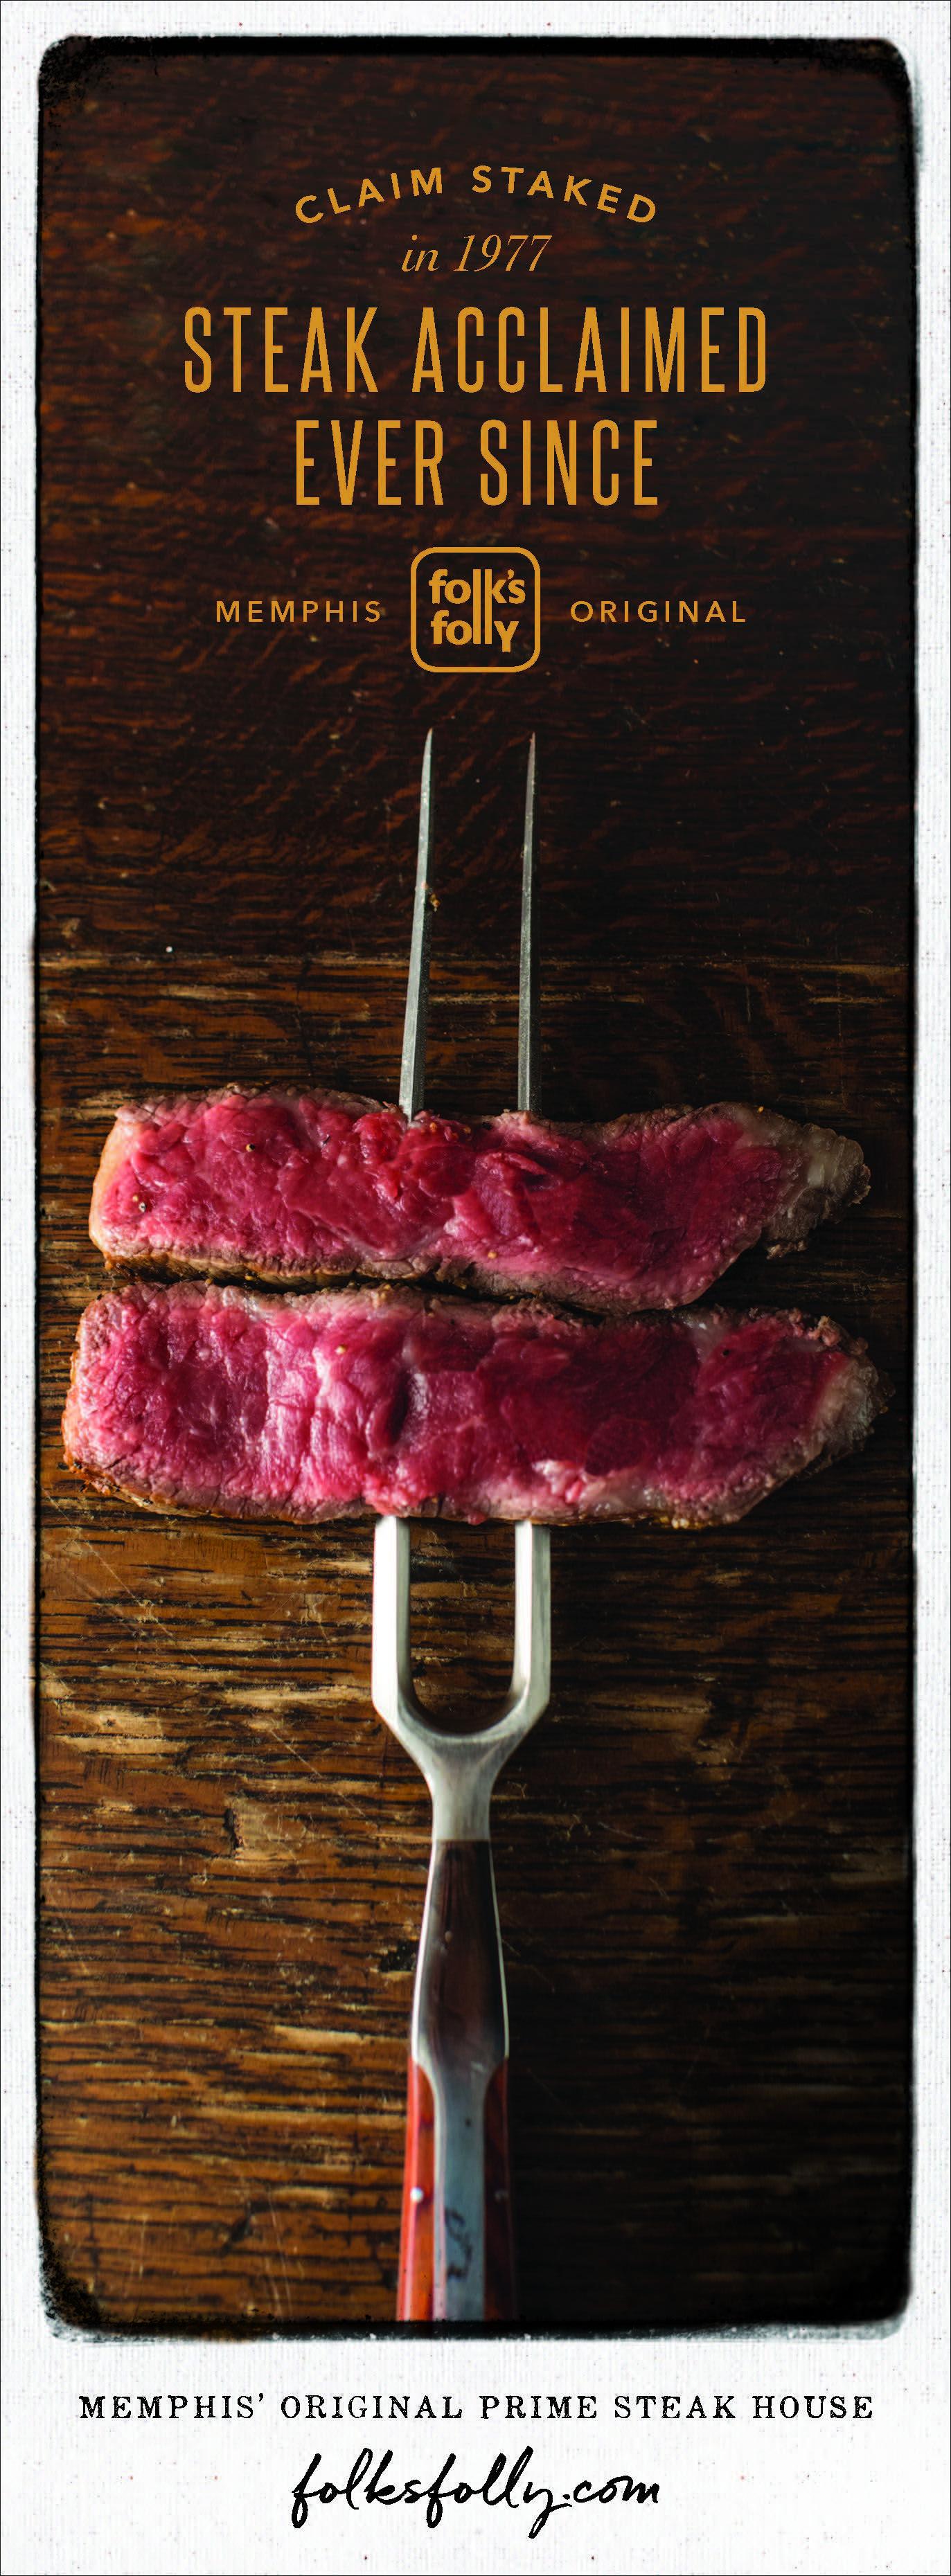 Folk's Folly Steak House Campaign_Page_2.jpg